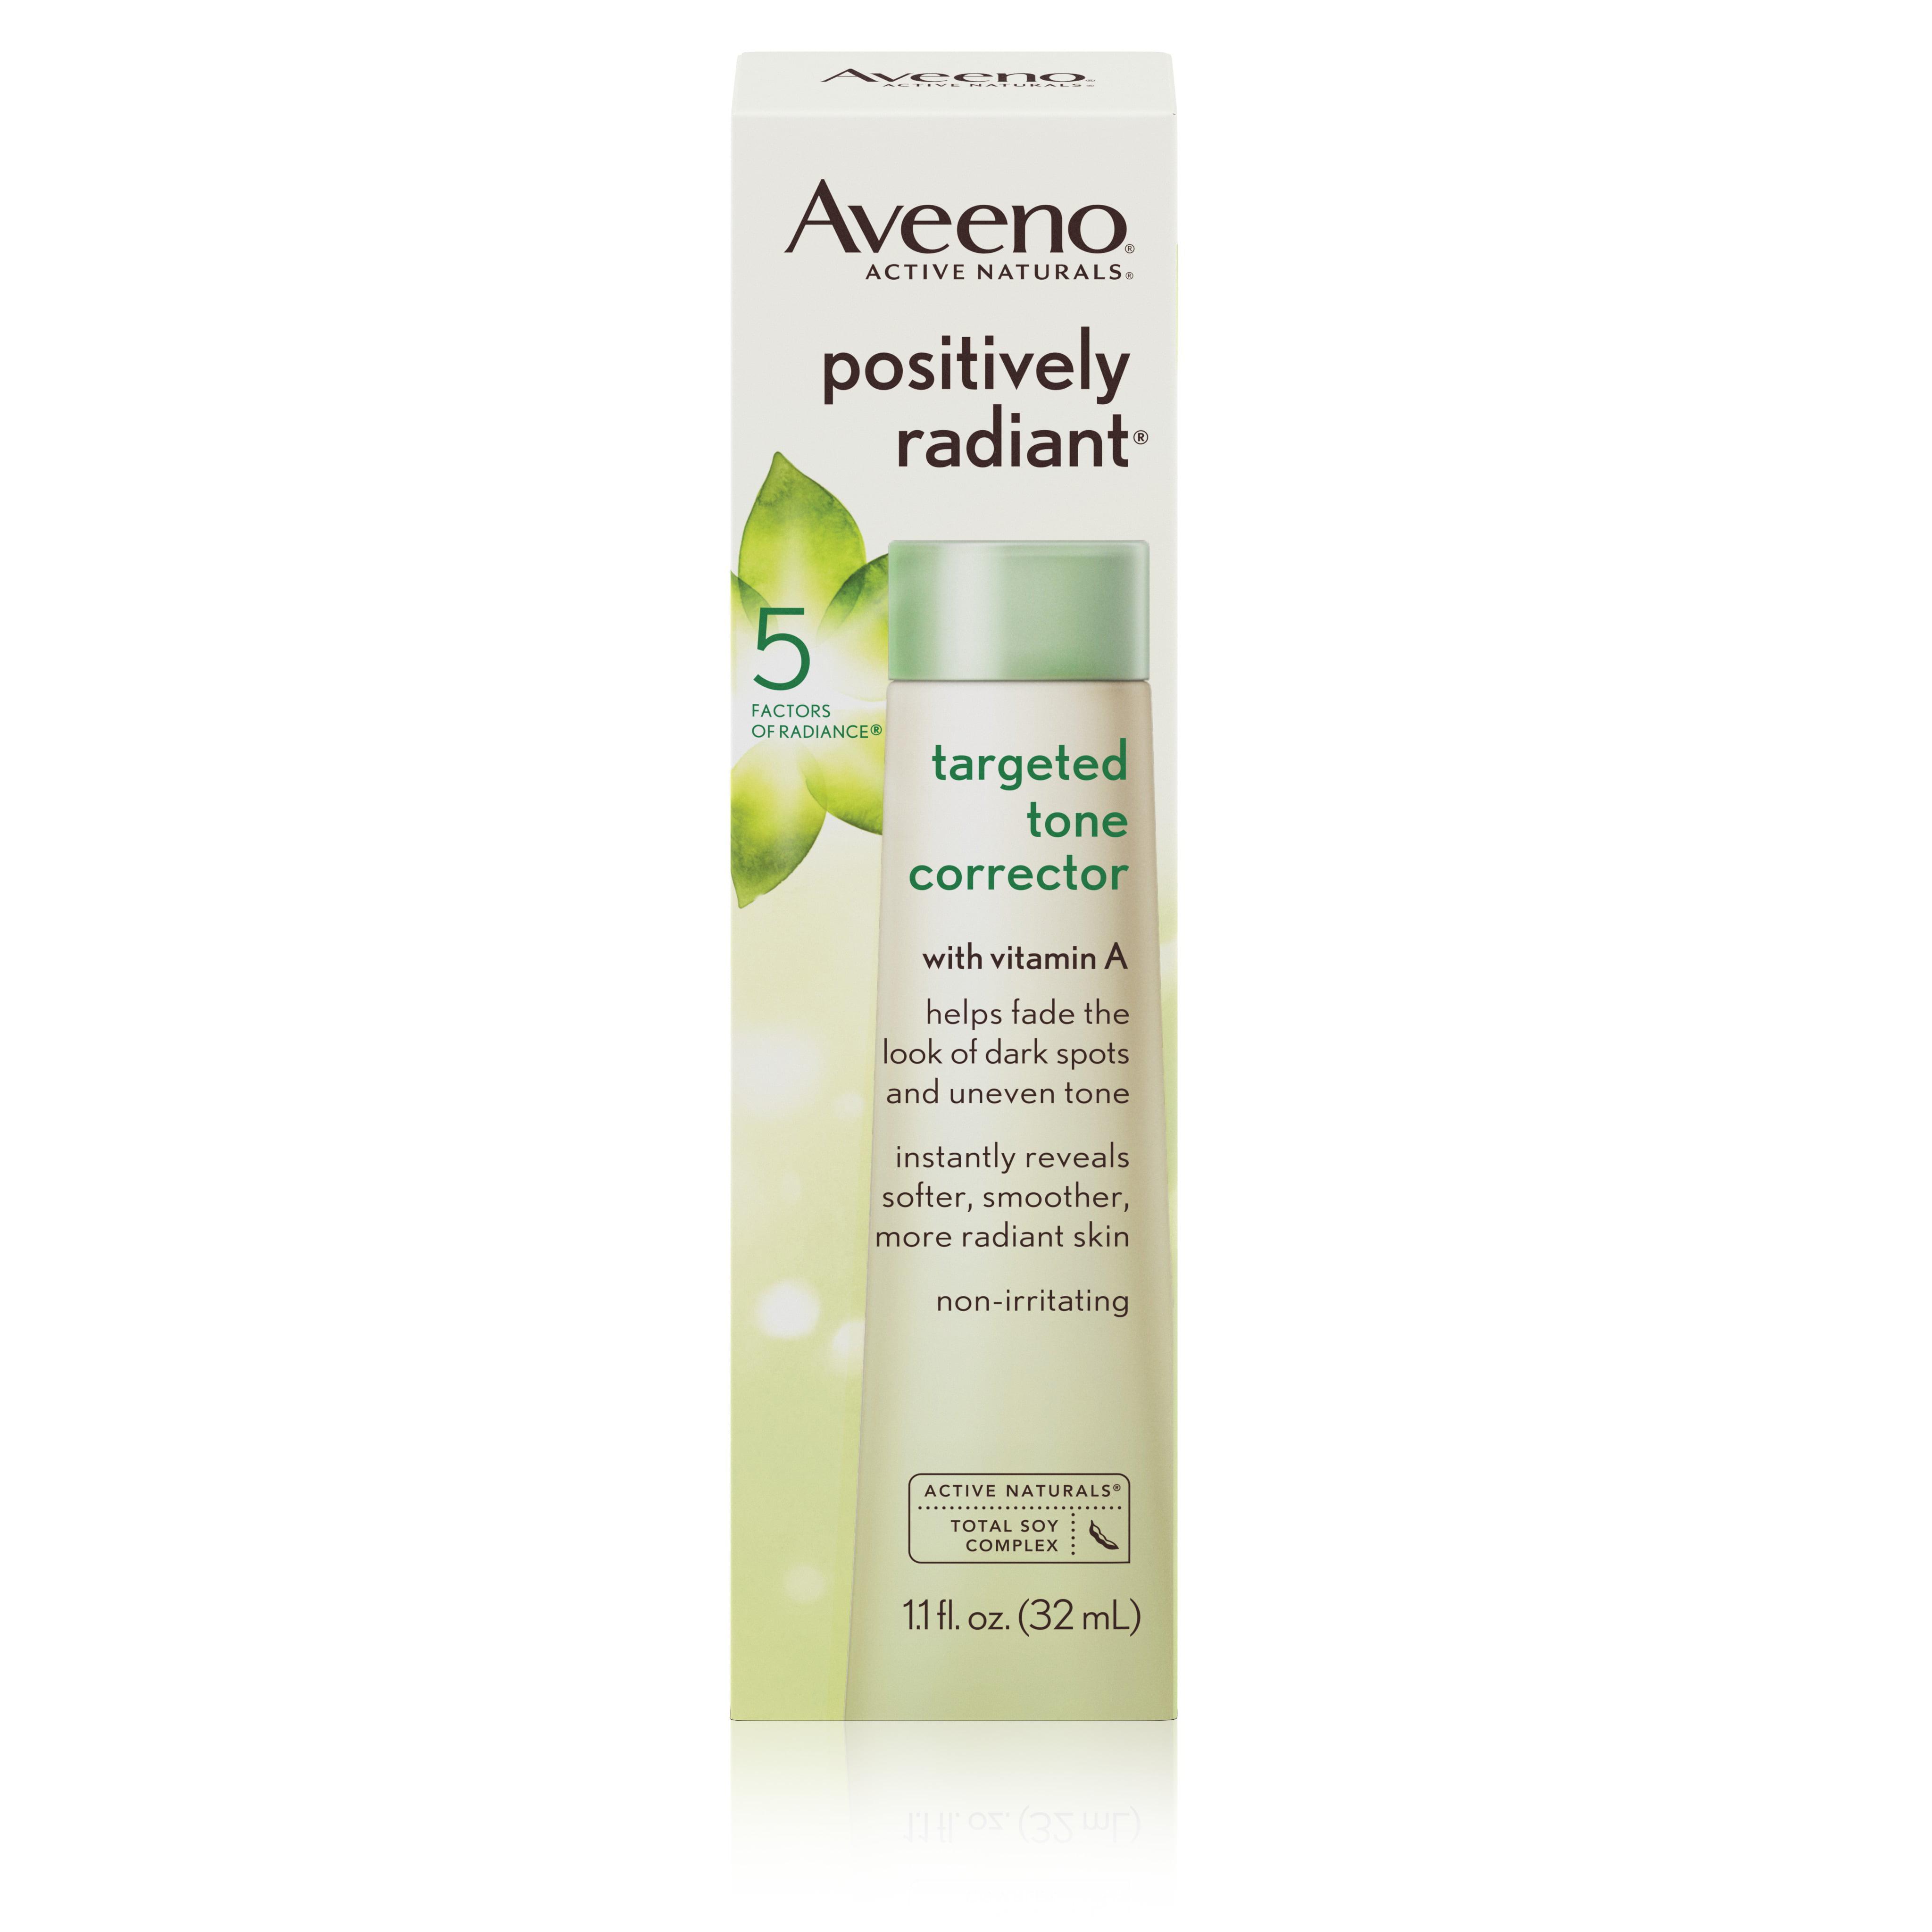 Aveeno Positively Radiant Targeted Tone Corrector, 1.1 Fl. Oz - Walmart.com